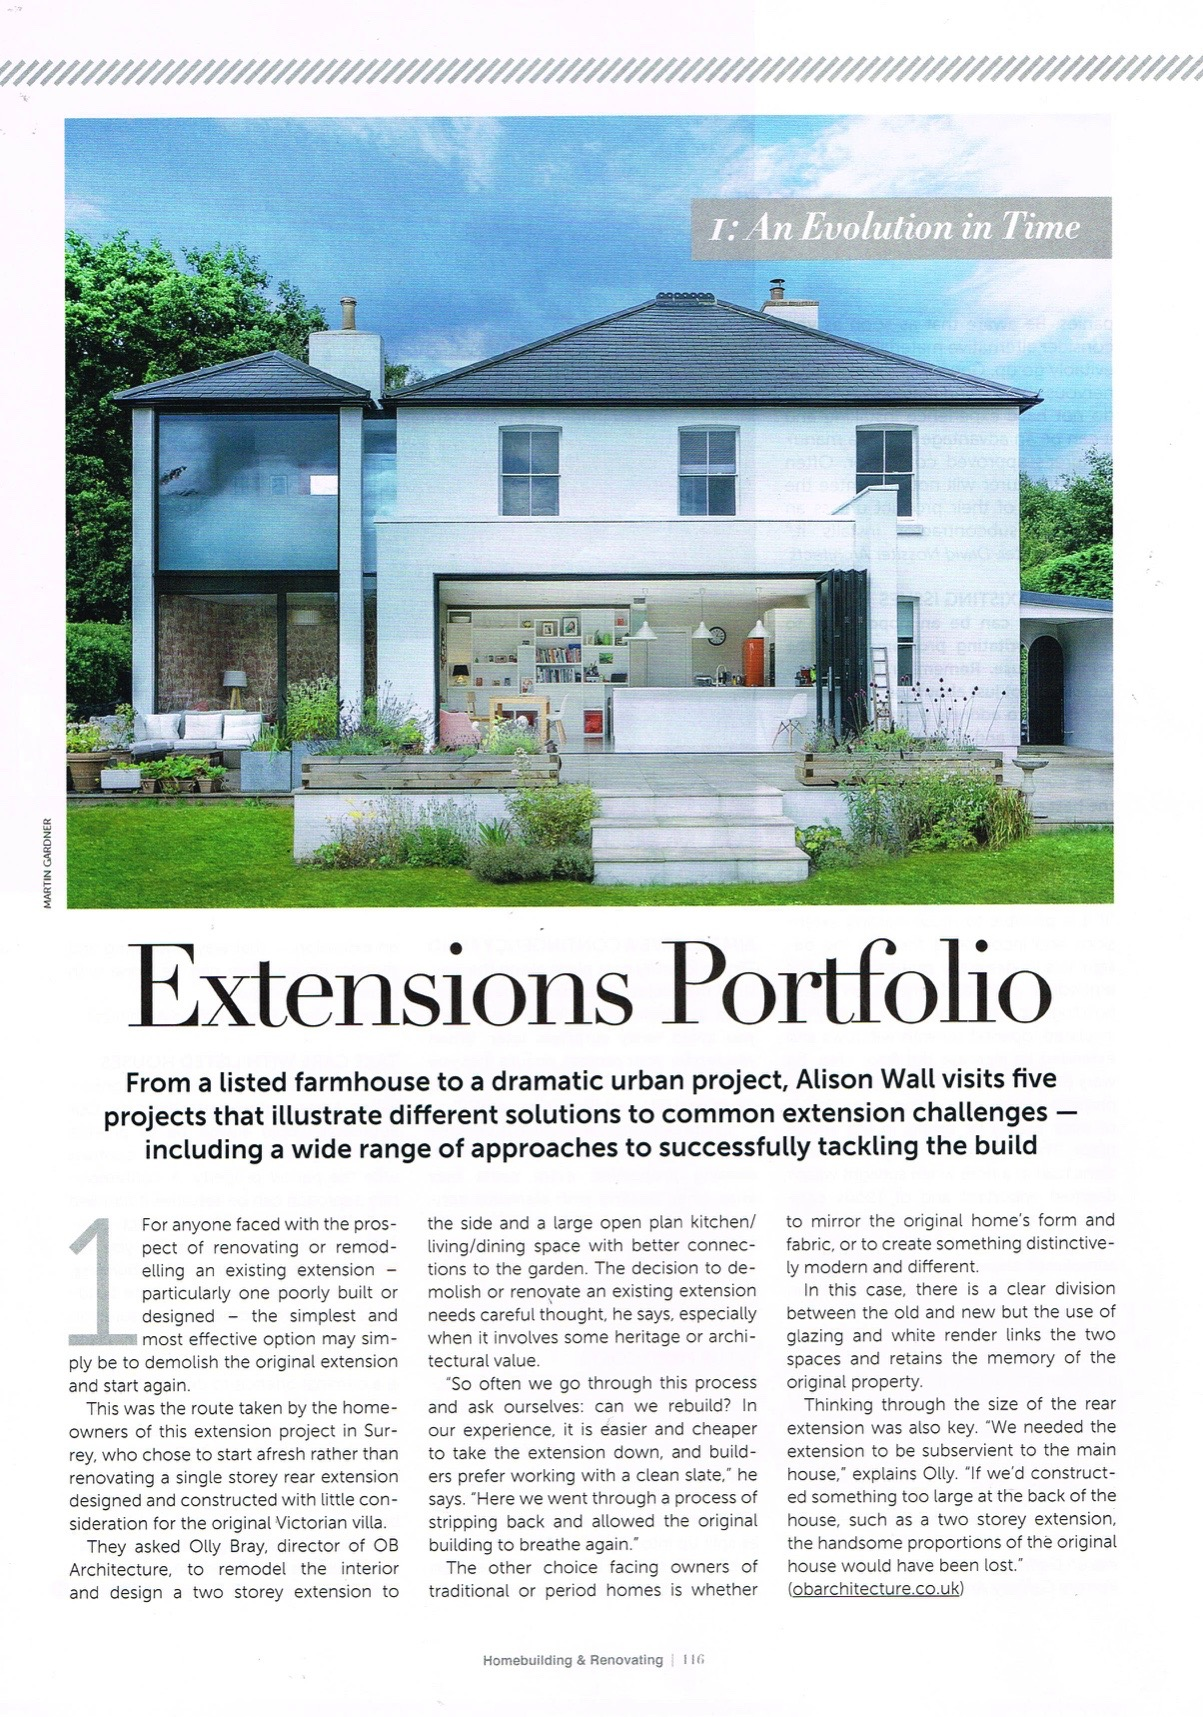 Homebuilding_Renovating_June_2016_OB_Architecture_Pine_House